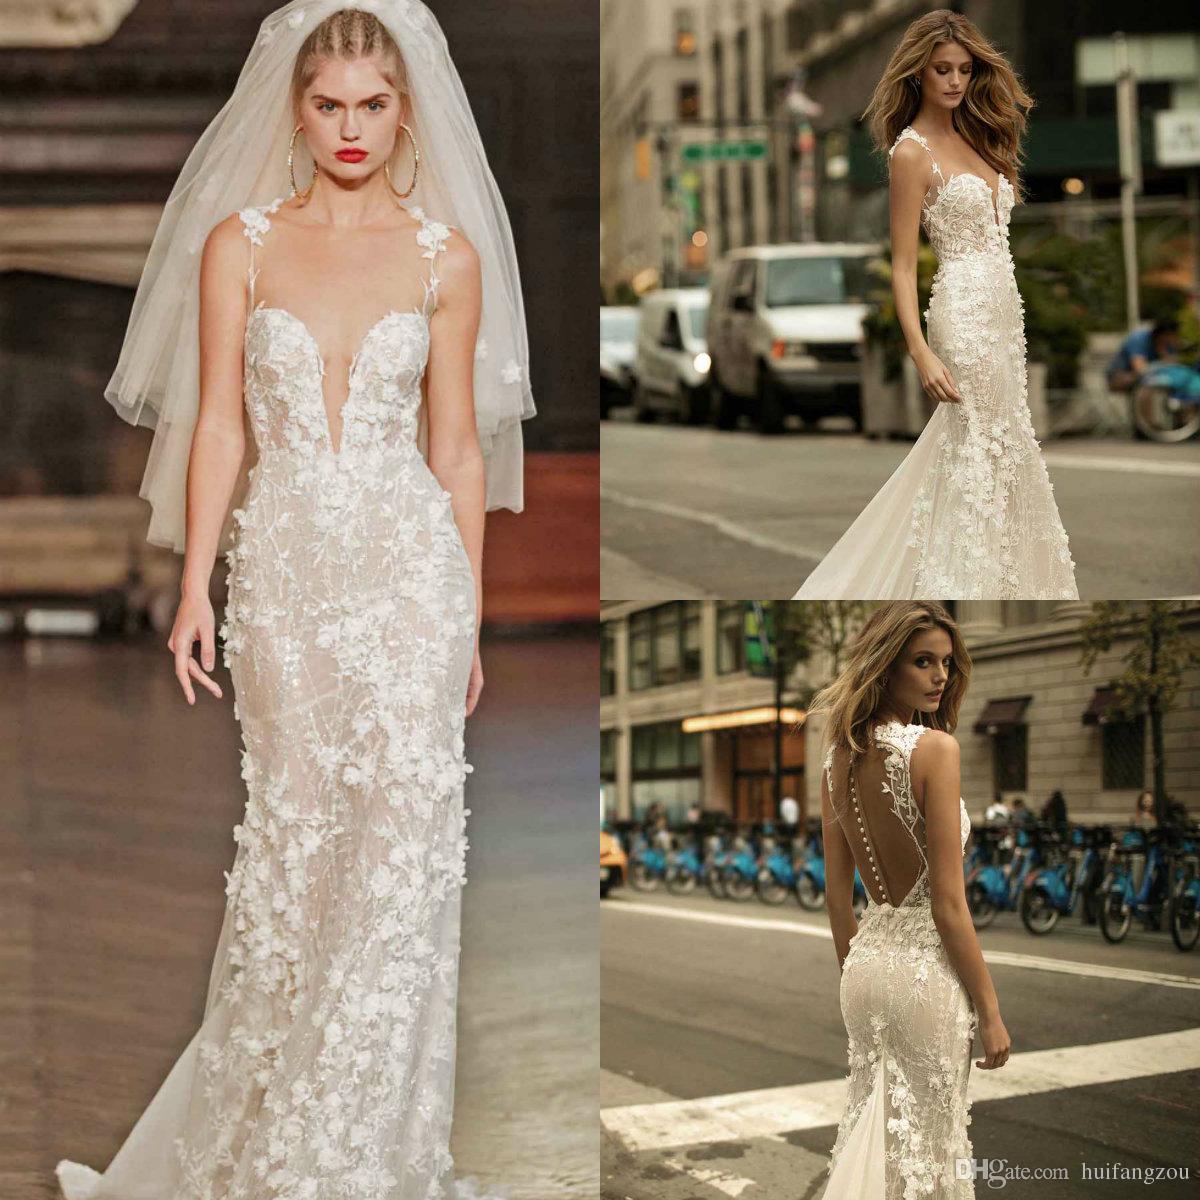 Berta 2018 Spaghetti Wedding Dresses Sexy Deep V Neck Full 3D Floral Applique Sweep Train Bridal Gowns Custom Made Wedding Dress